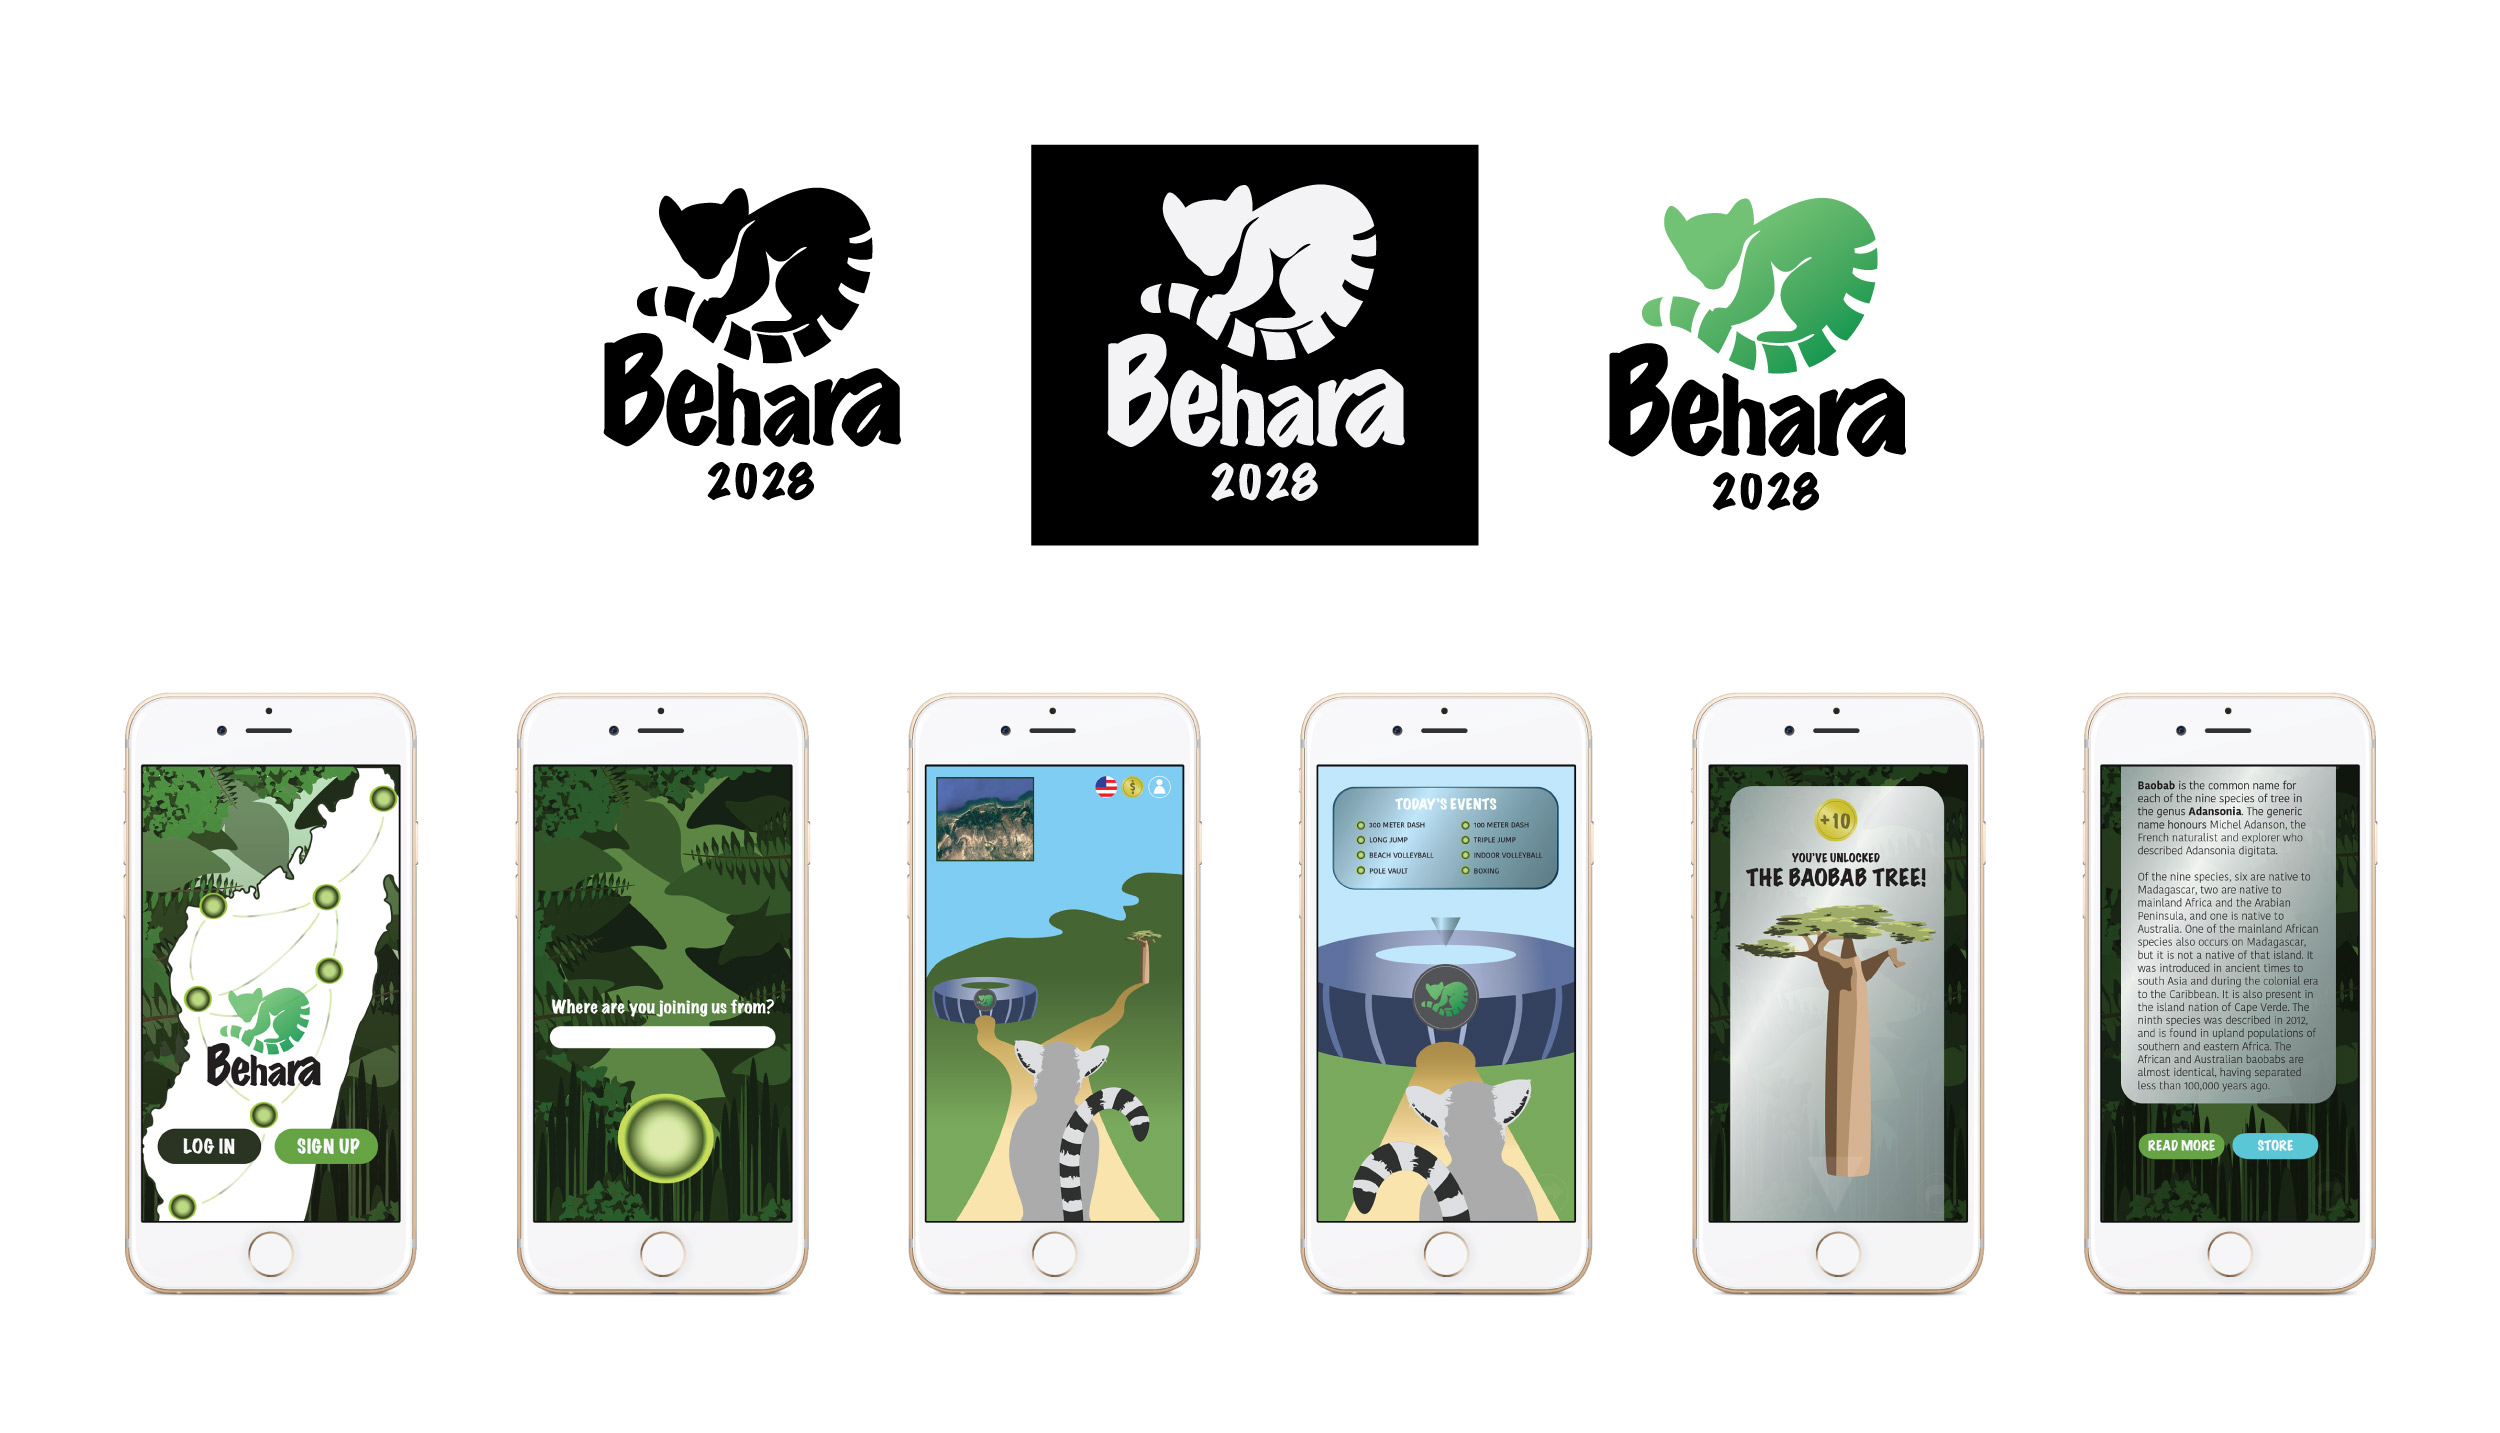 Bahara-logo-app-mockup.jpg